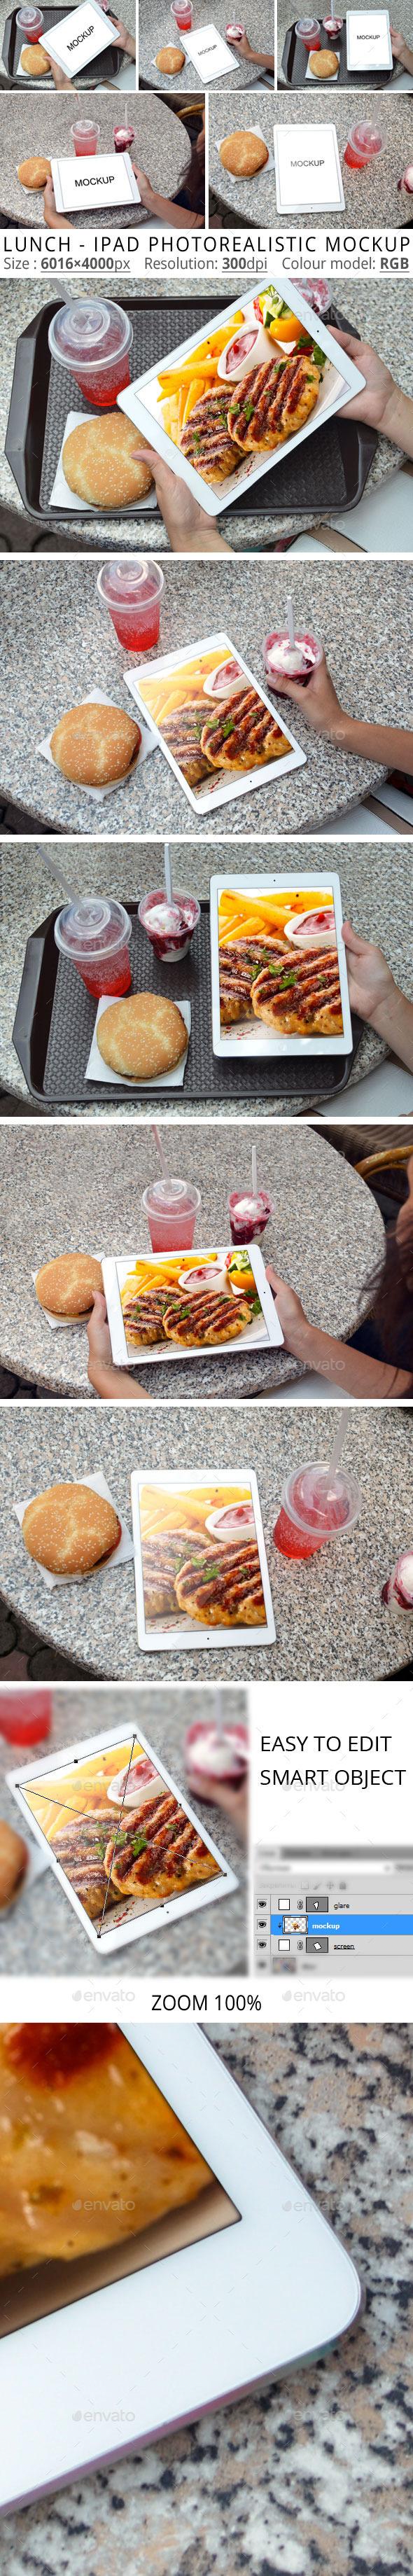 Lunch - IPad Photorealistic MockUp - Mobile Displays